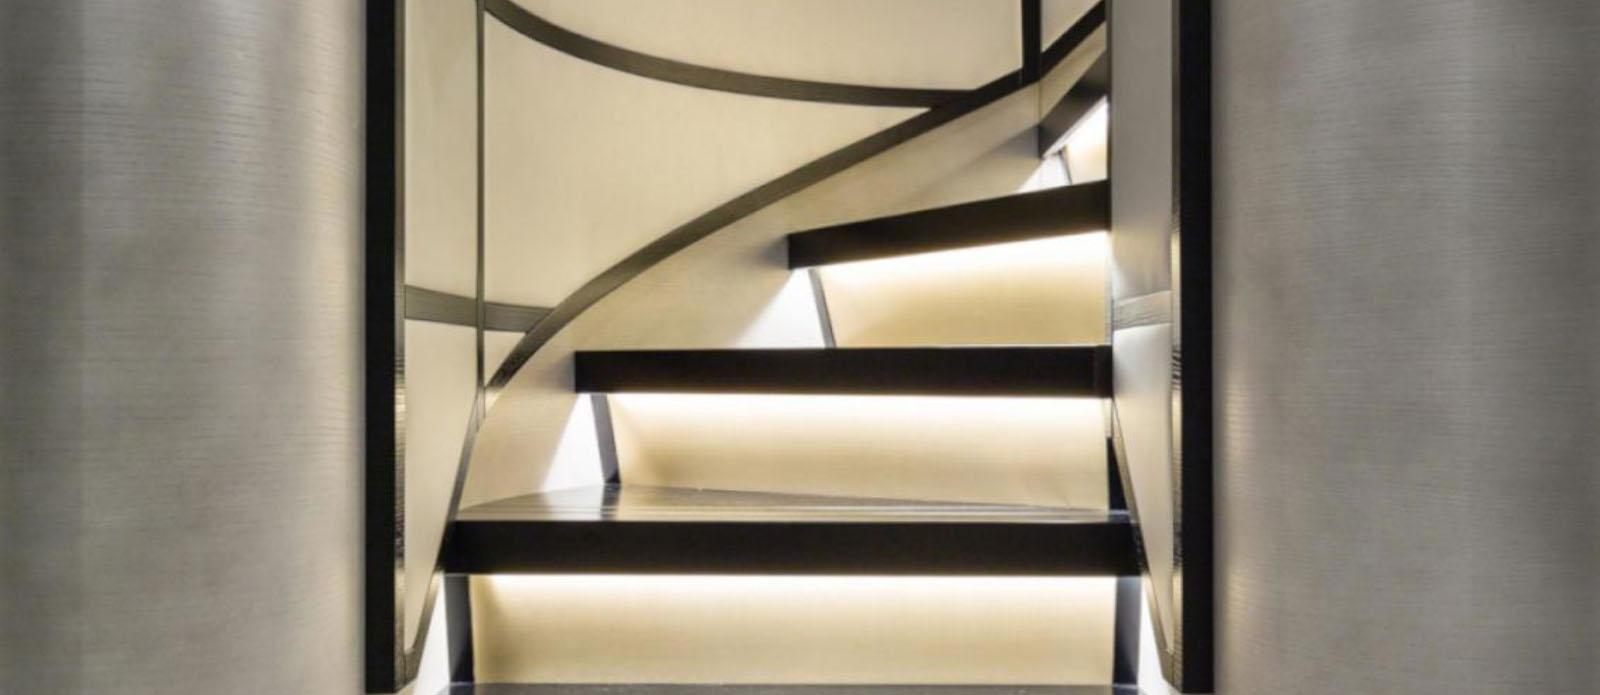 Da Vinci-Mangusta-Stairs